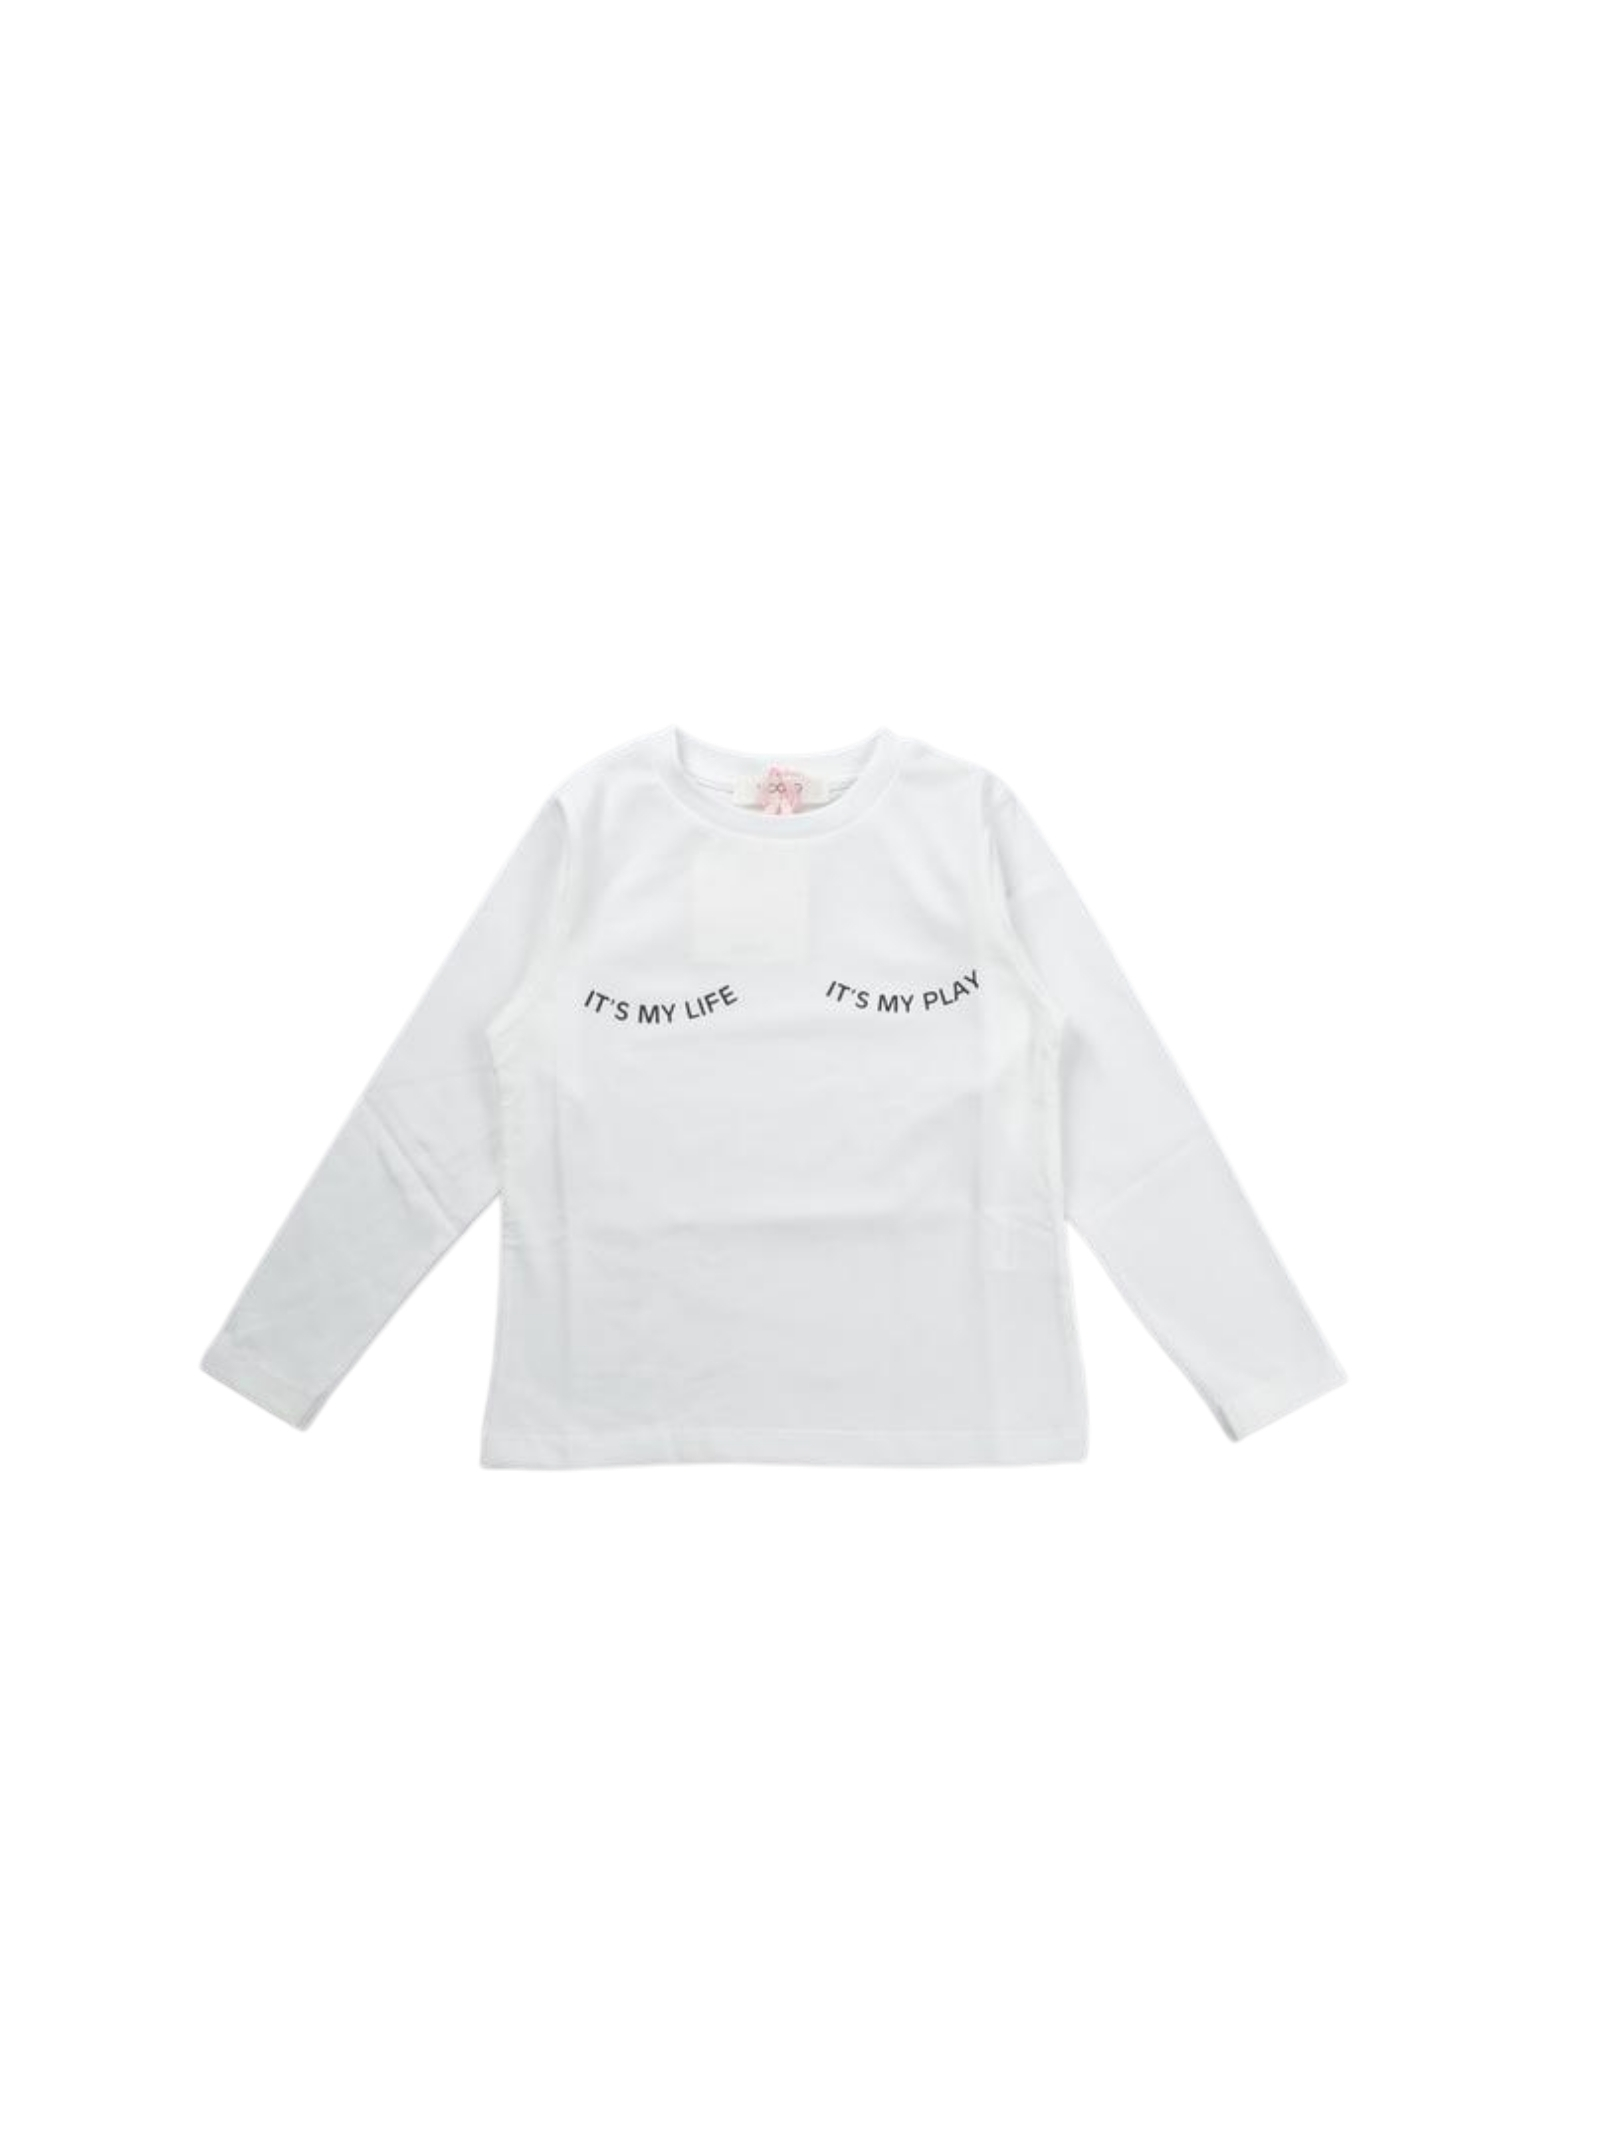 My Life Basic Girl Sweater VICOLO KIDS |  | 3141M0547PANNA